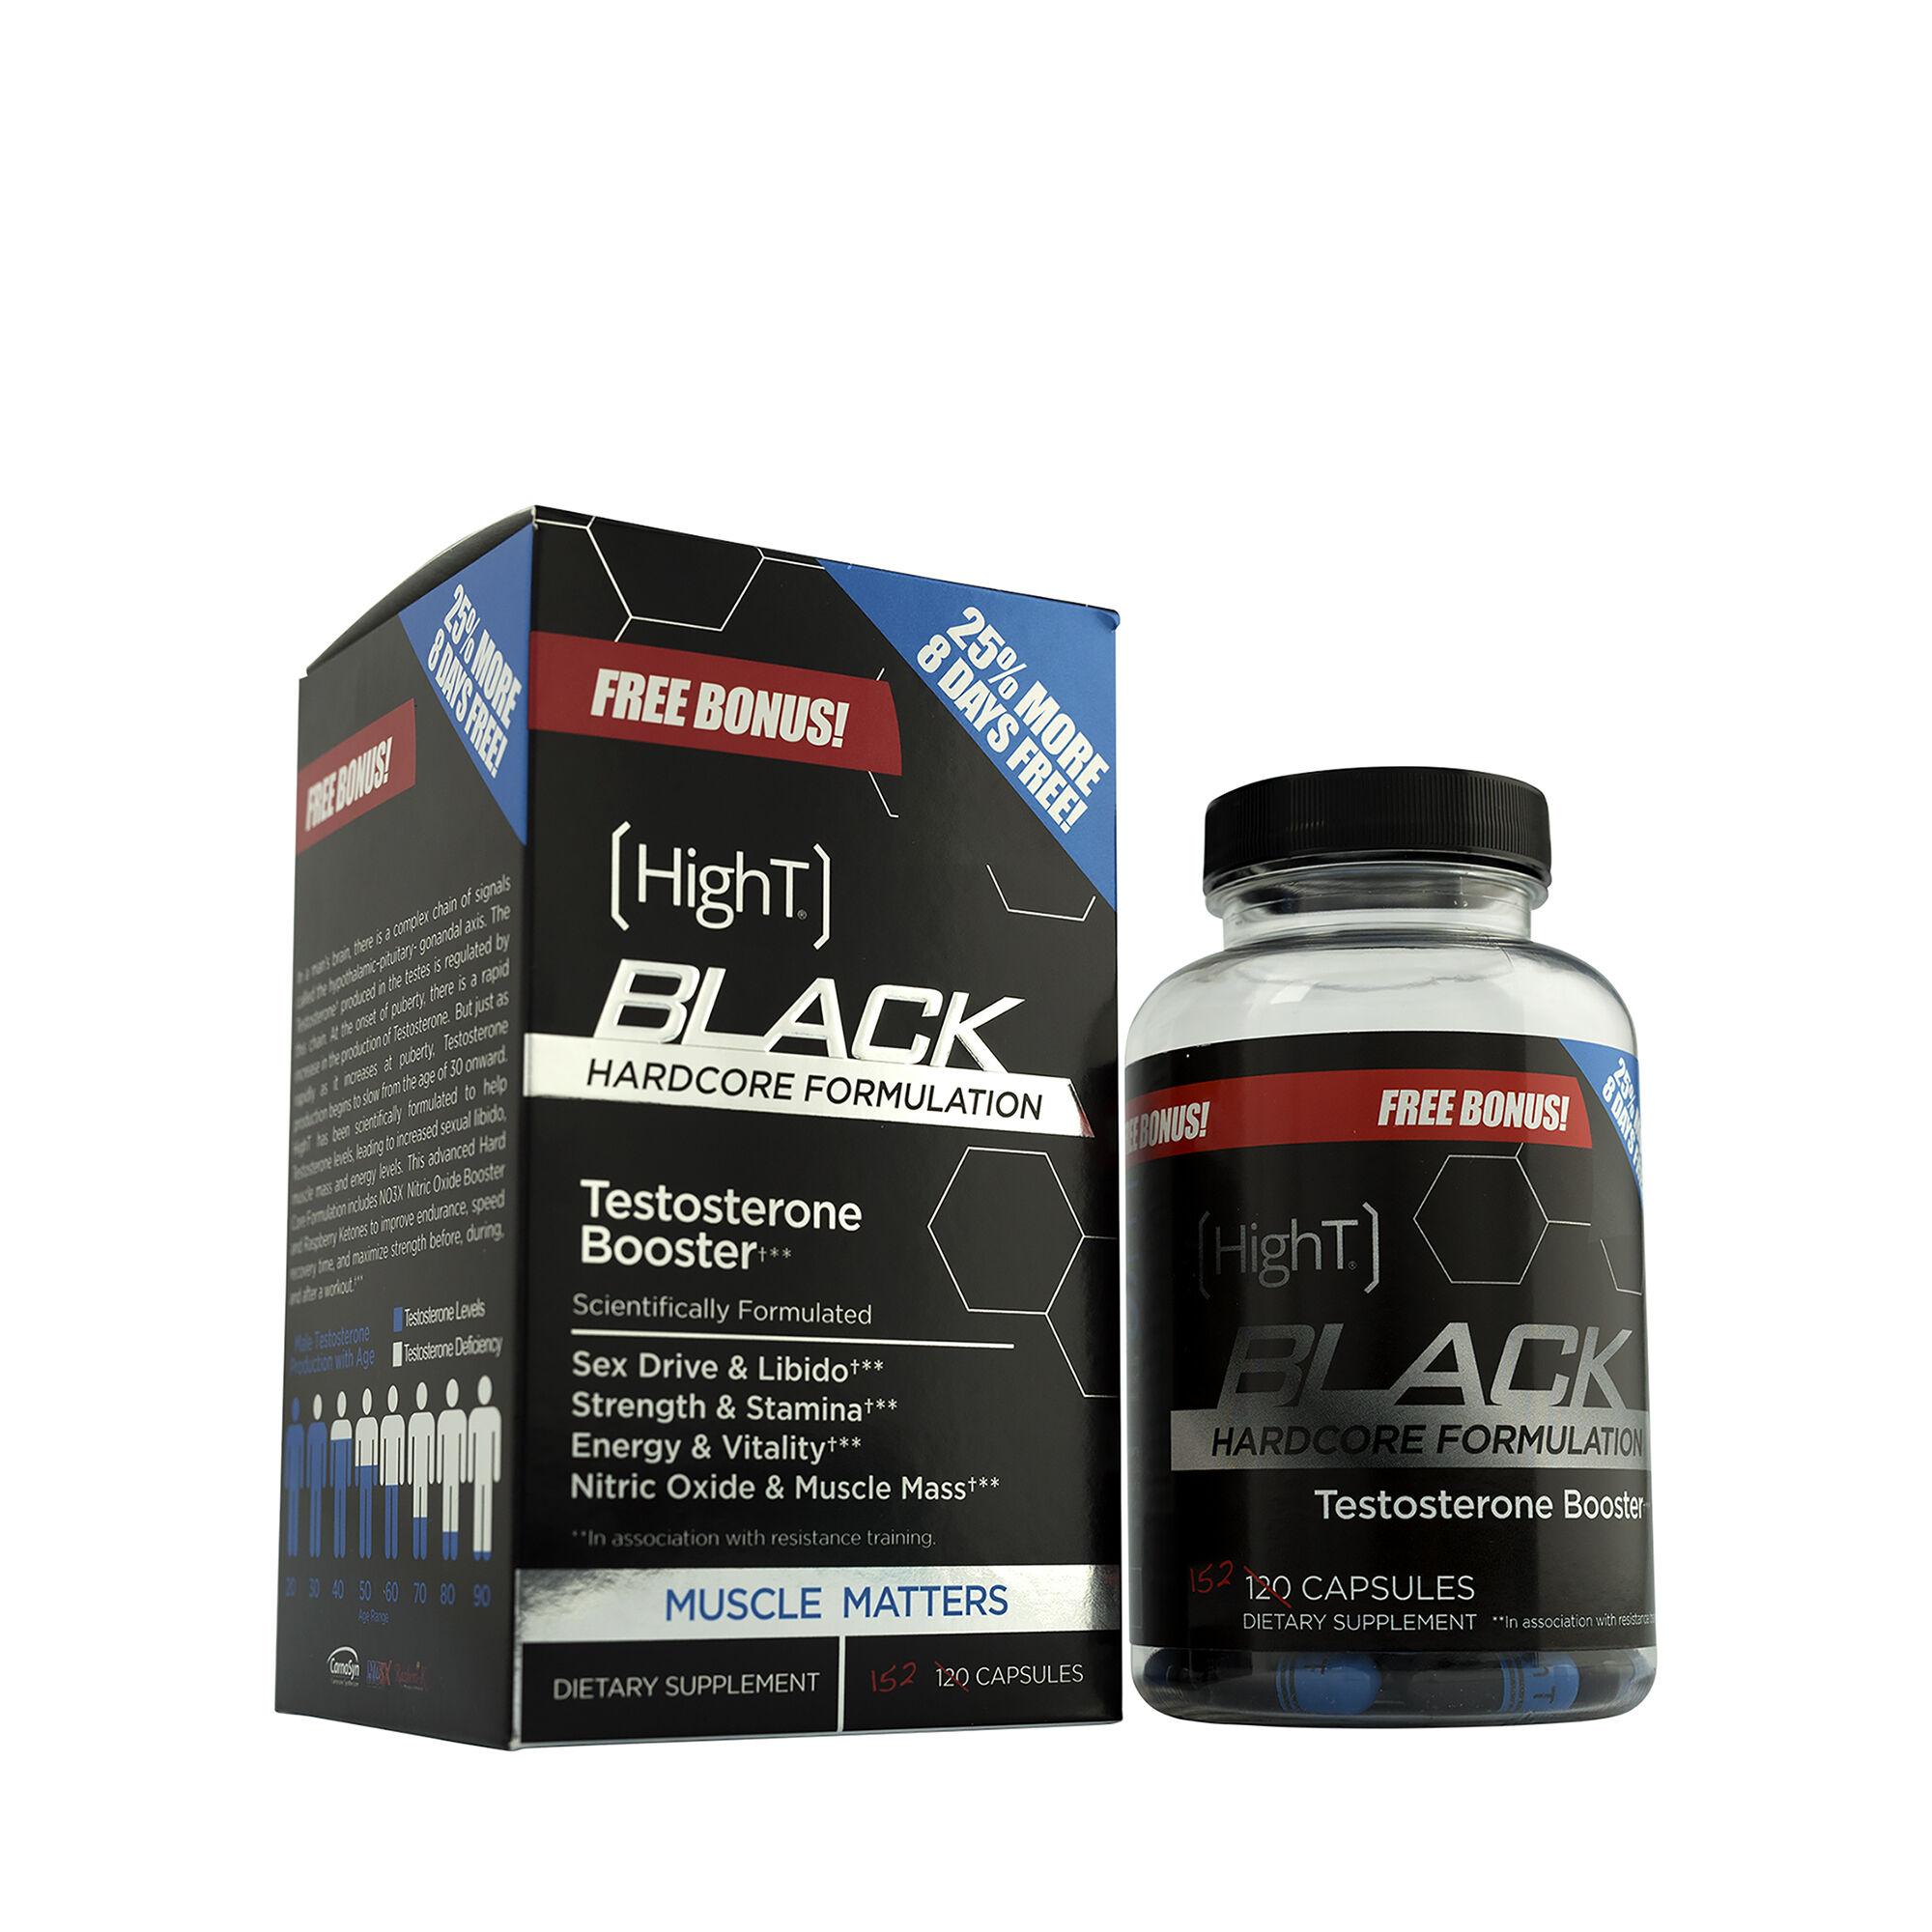 Black testosterone booster